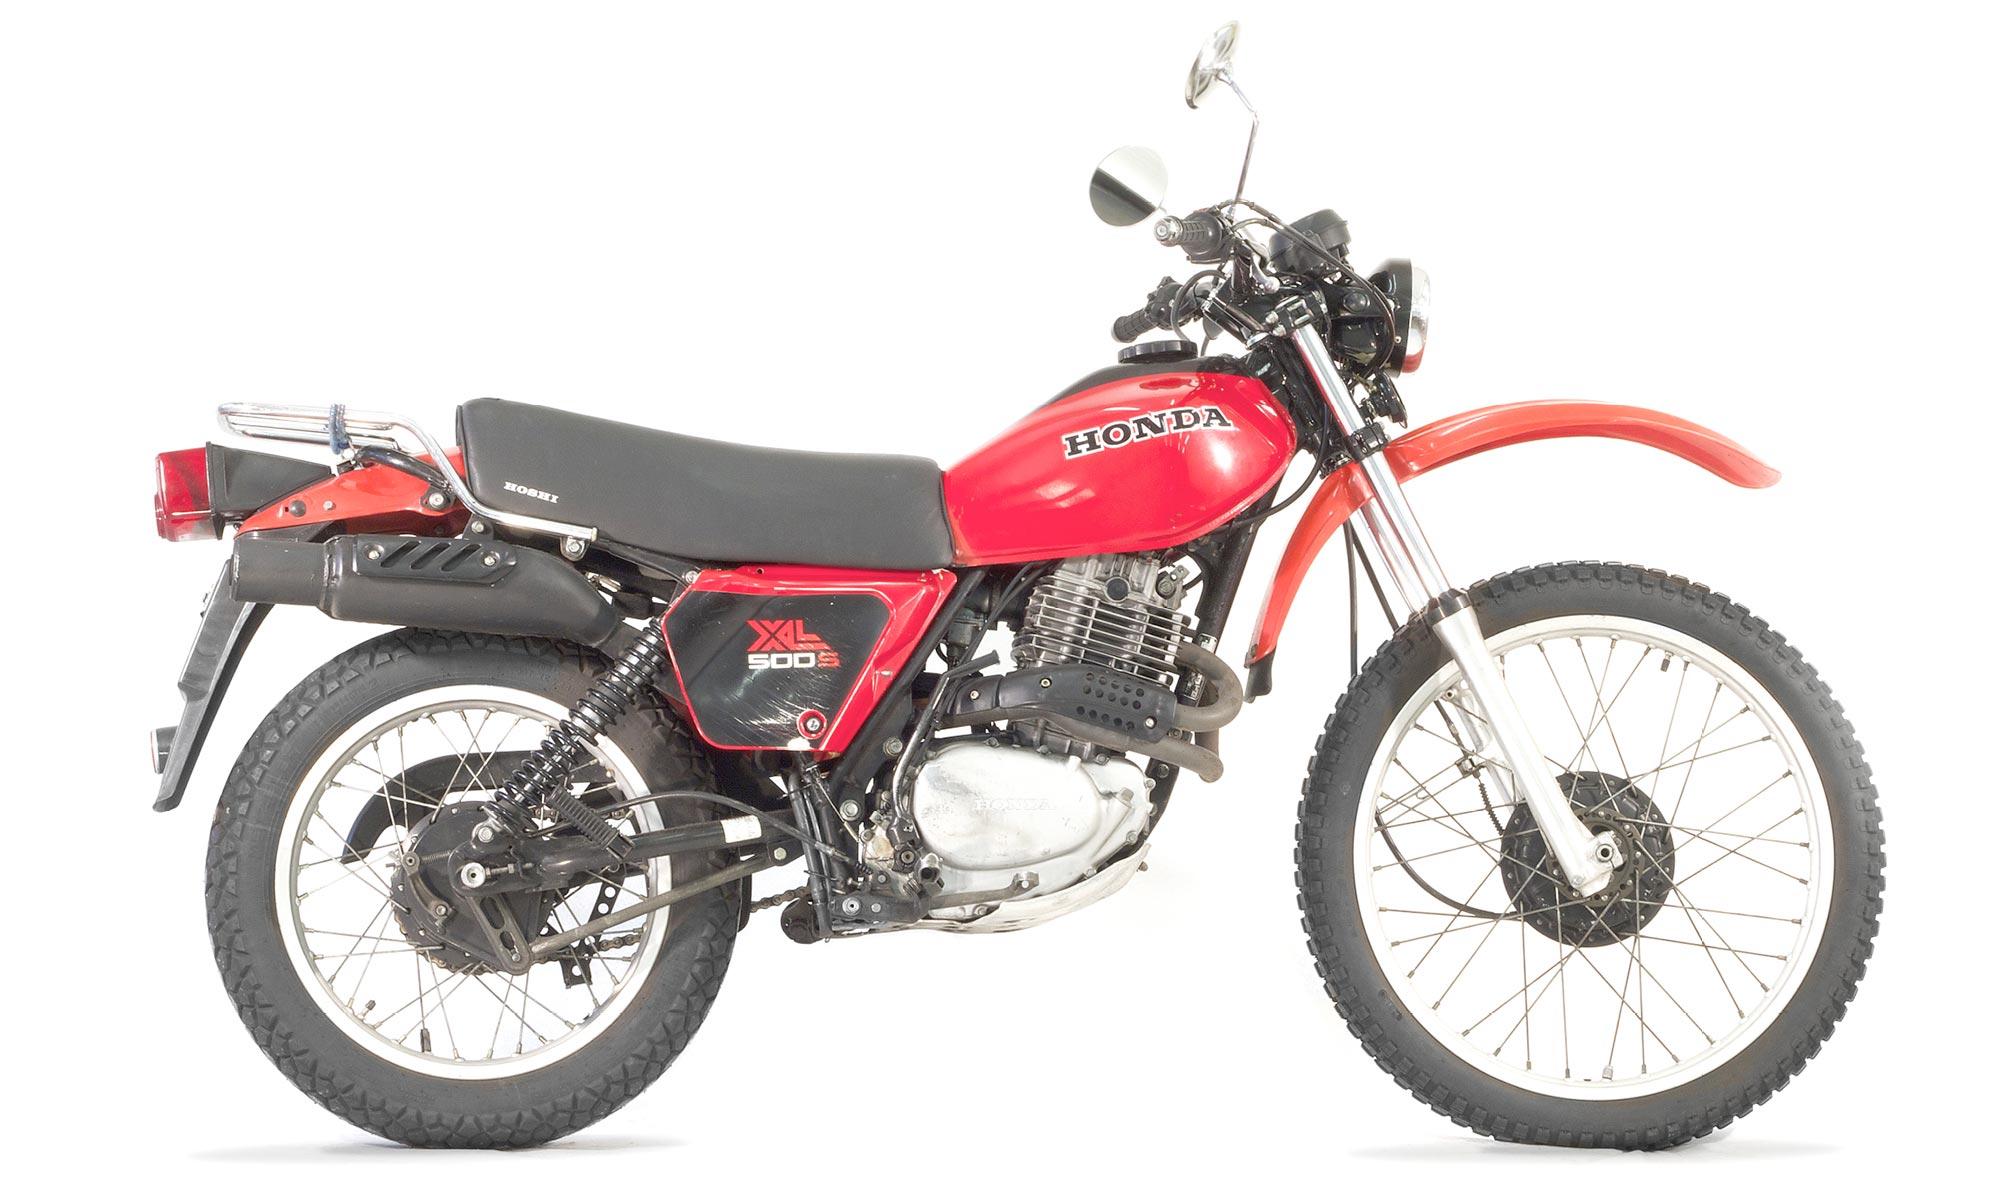 Honda_XL_500s_Rot